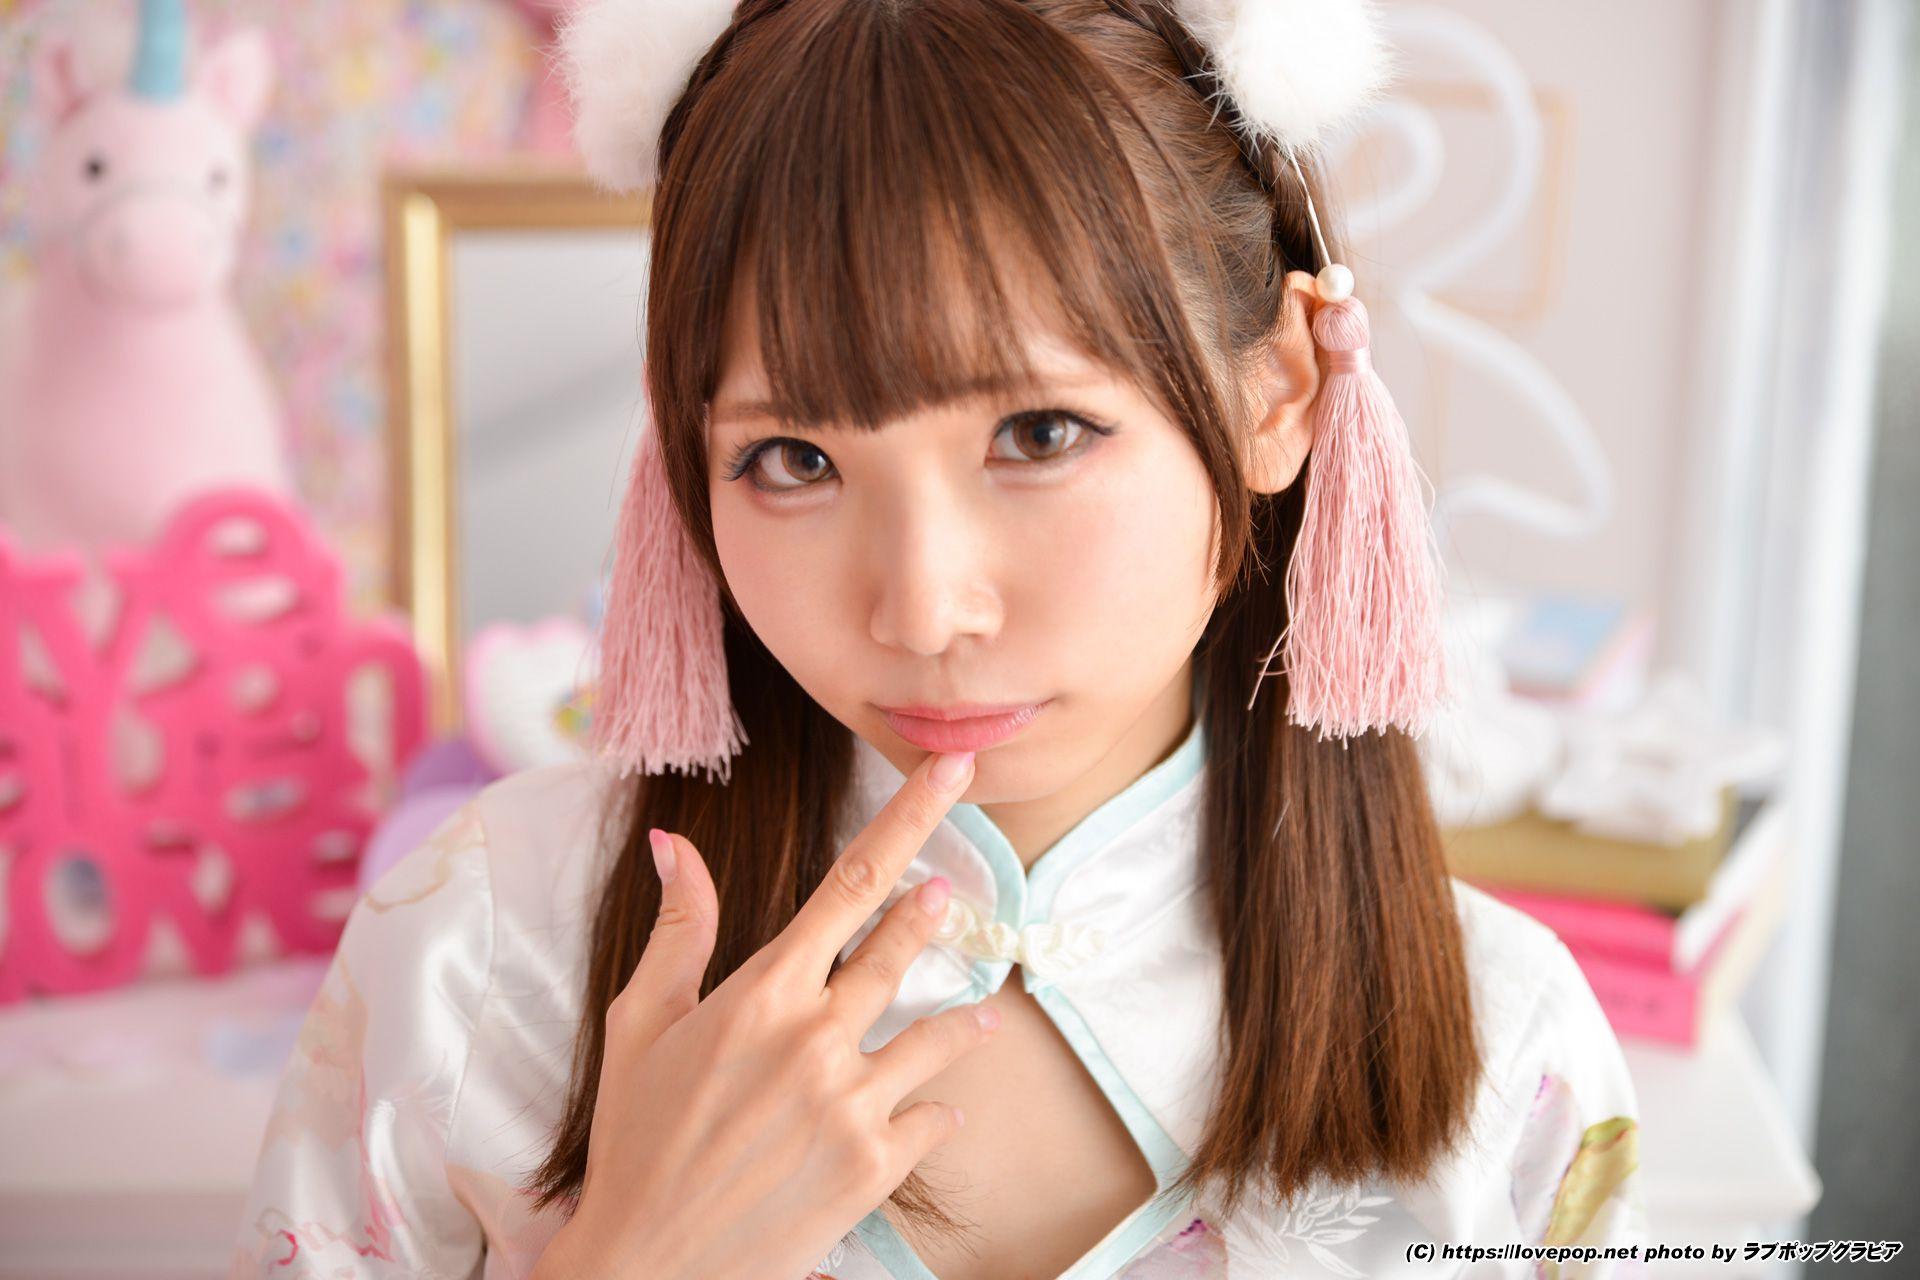 [LOVEPOP] 姫宫まほれ Mahore Himemiya Photoset 04 写真集[70P]插图(3)